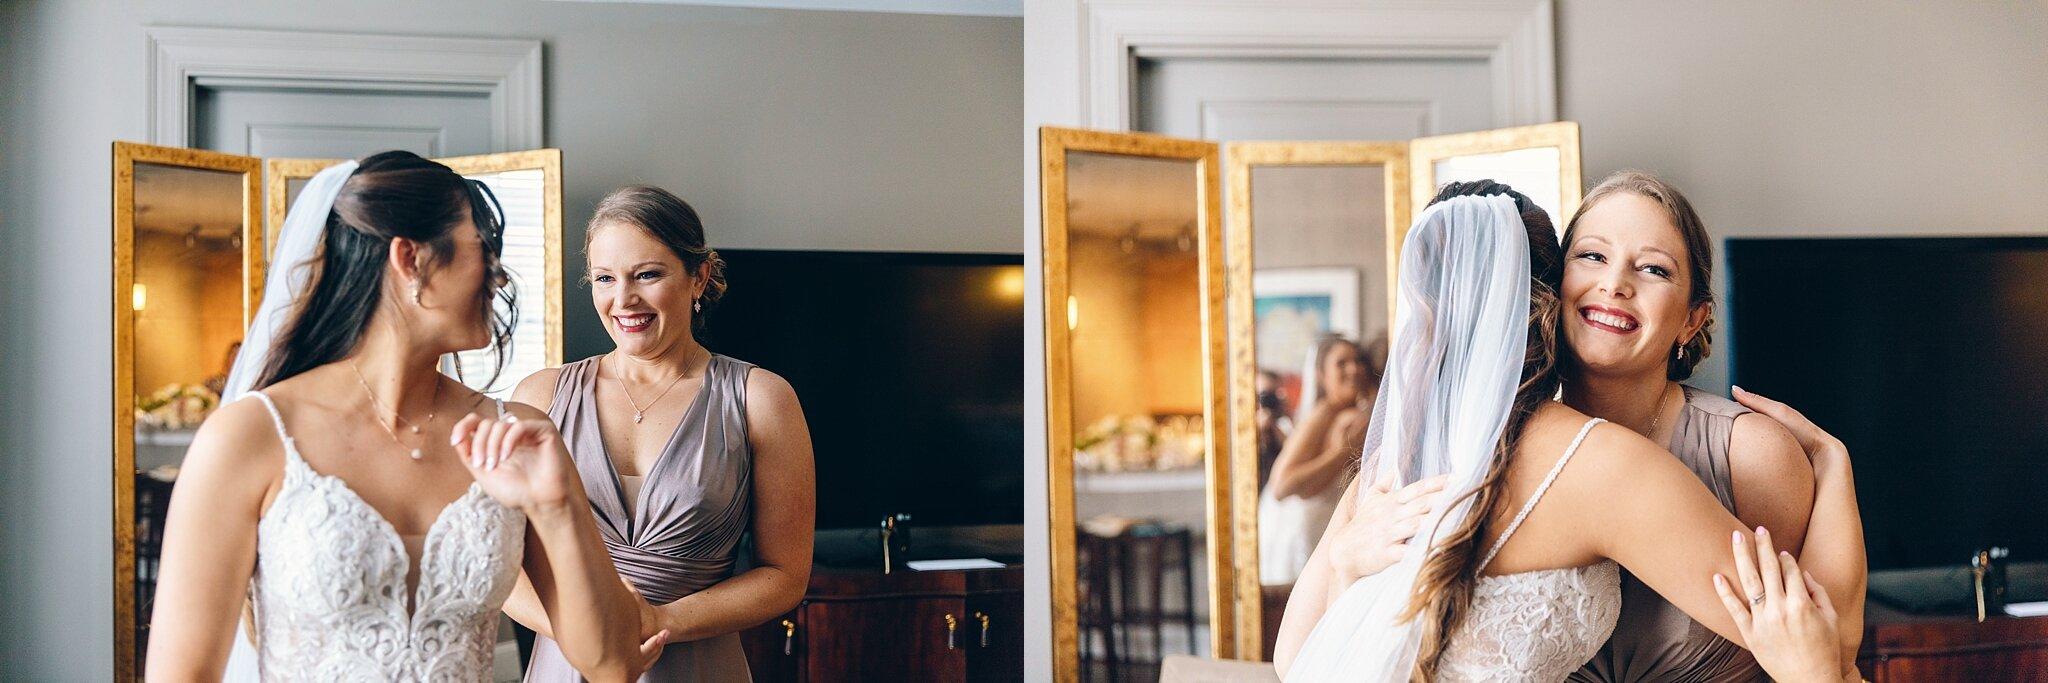 patrick-henry-ballroom-wedding-roanoke_0475.jpg